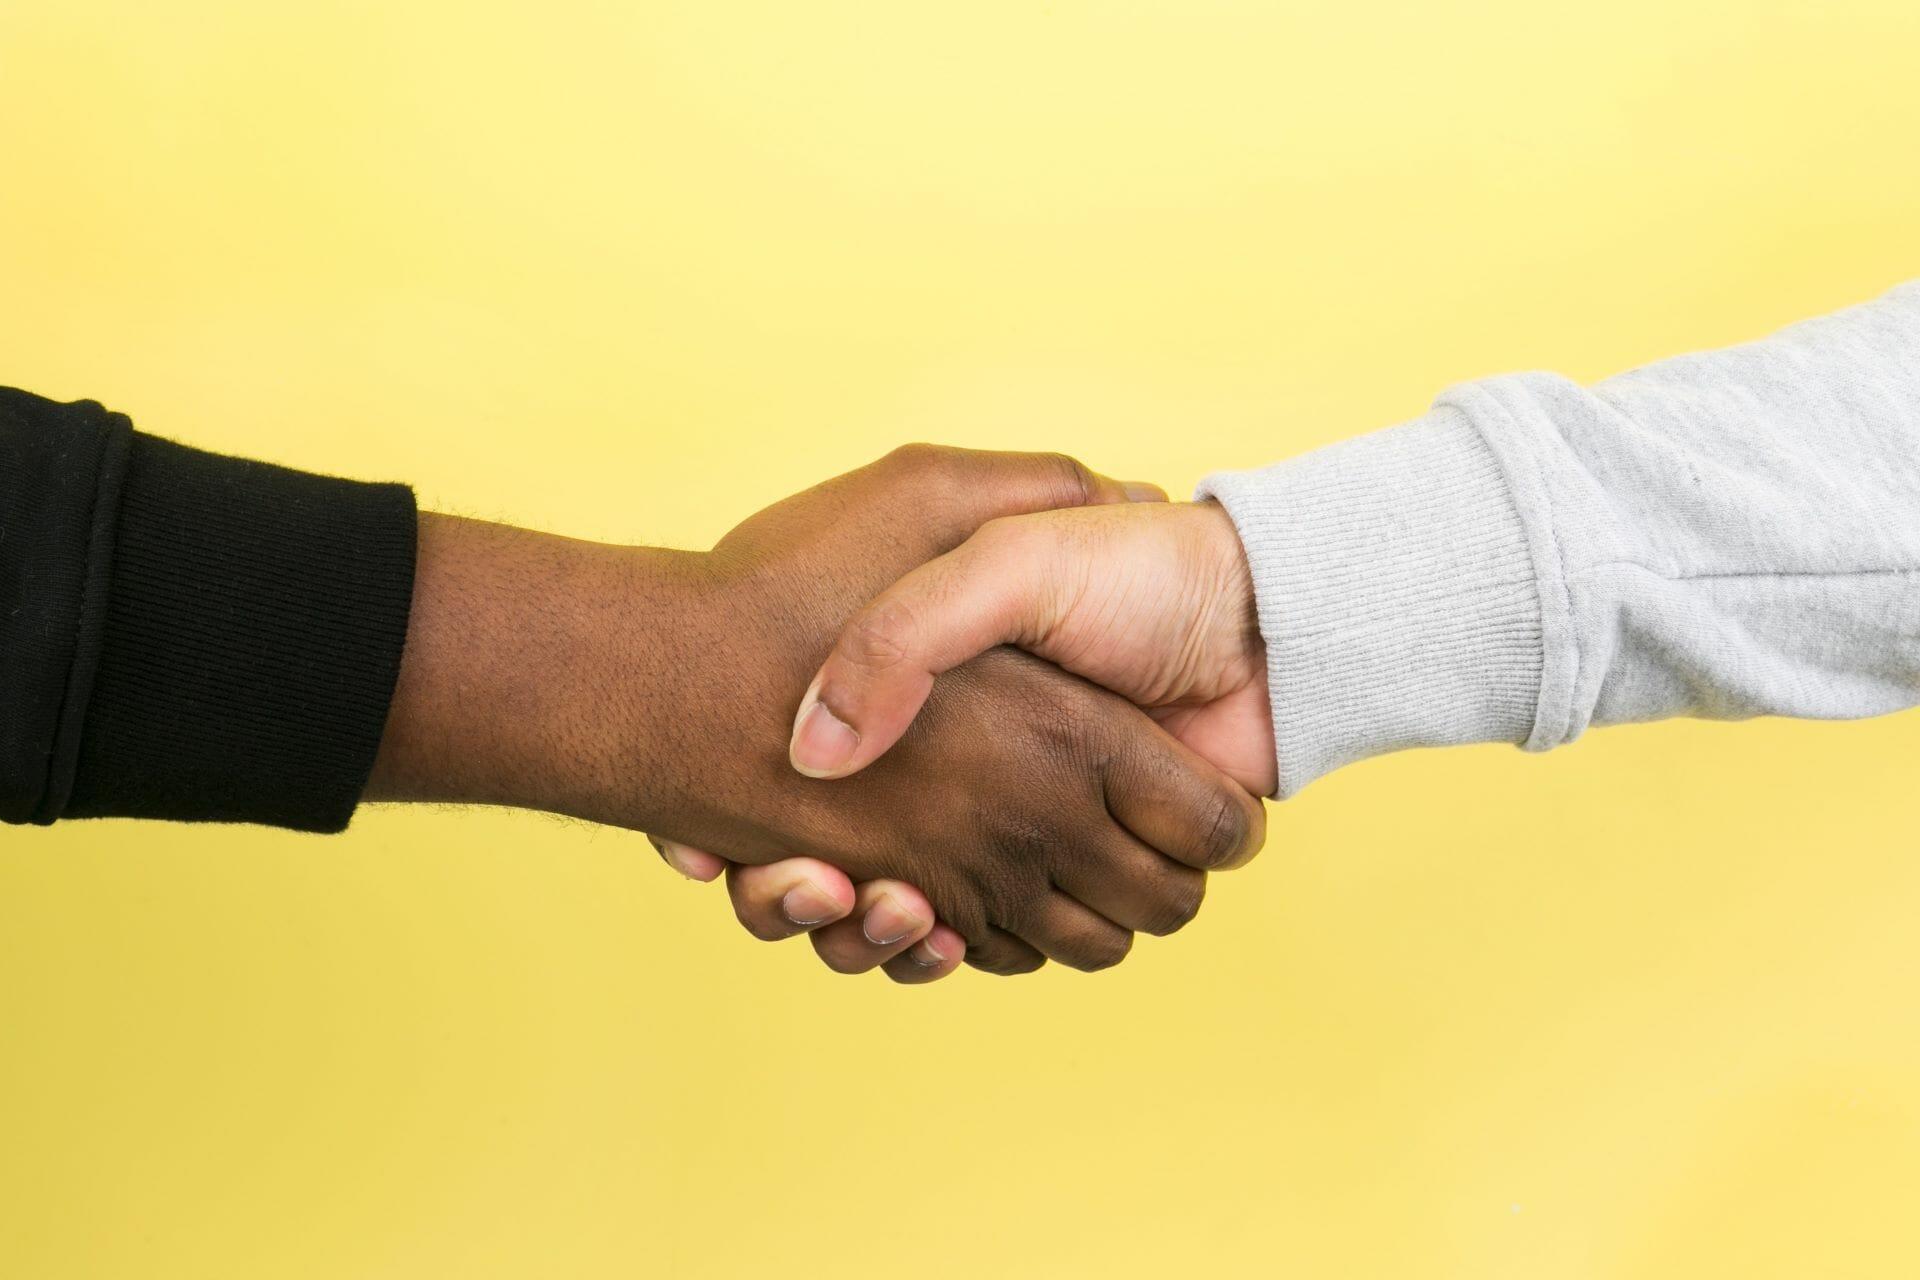 citi-and-att-extend-credit-card-partnership